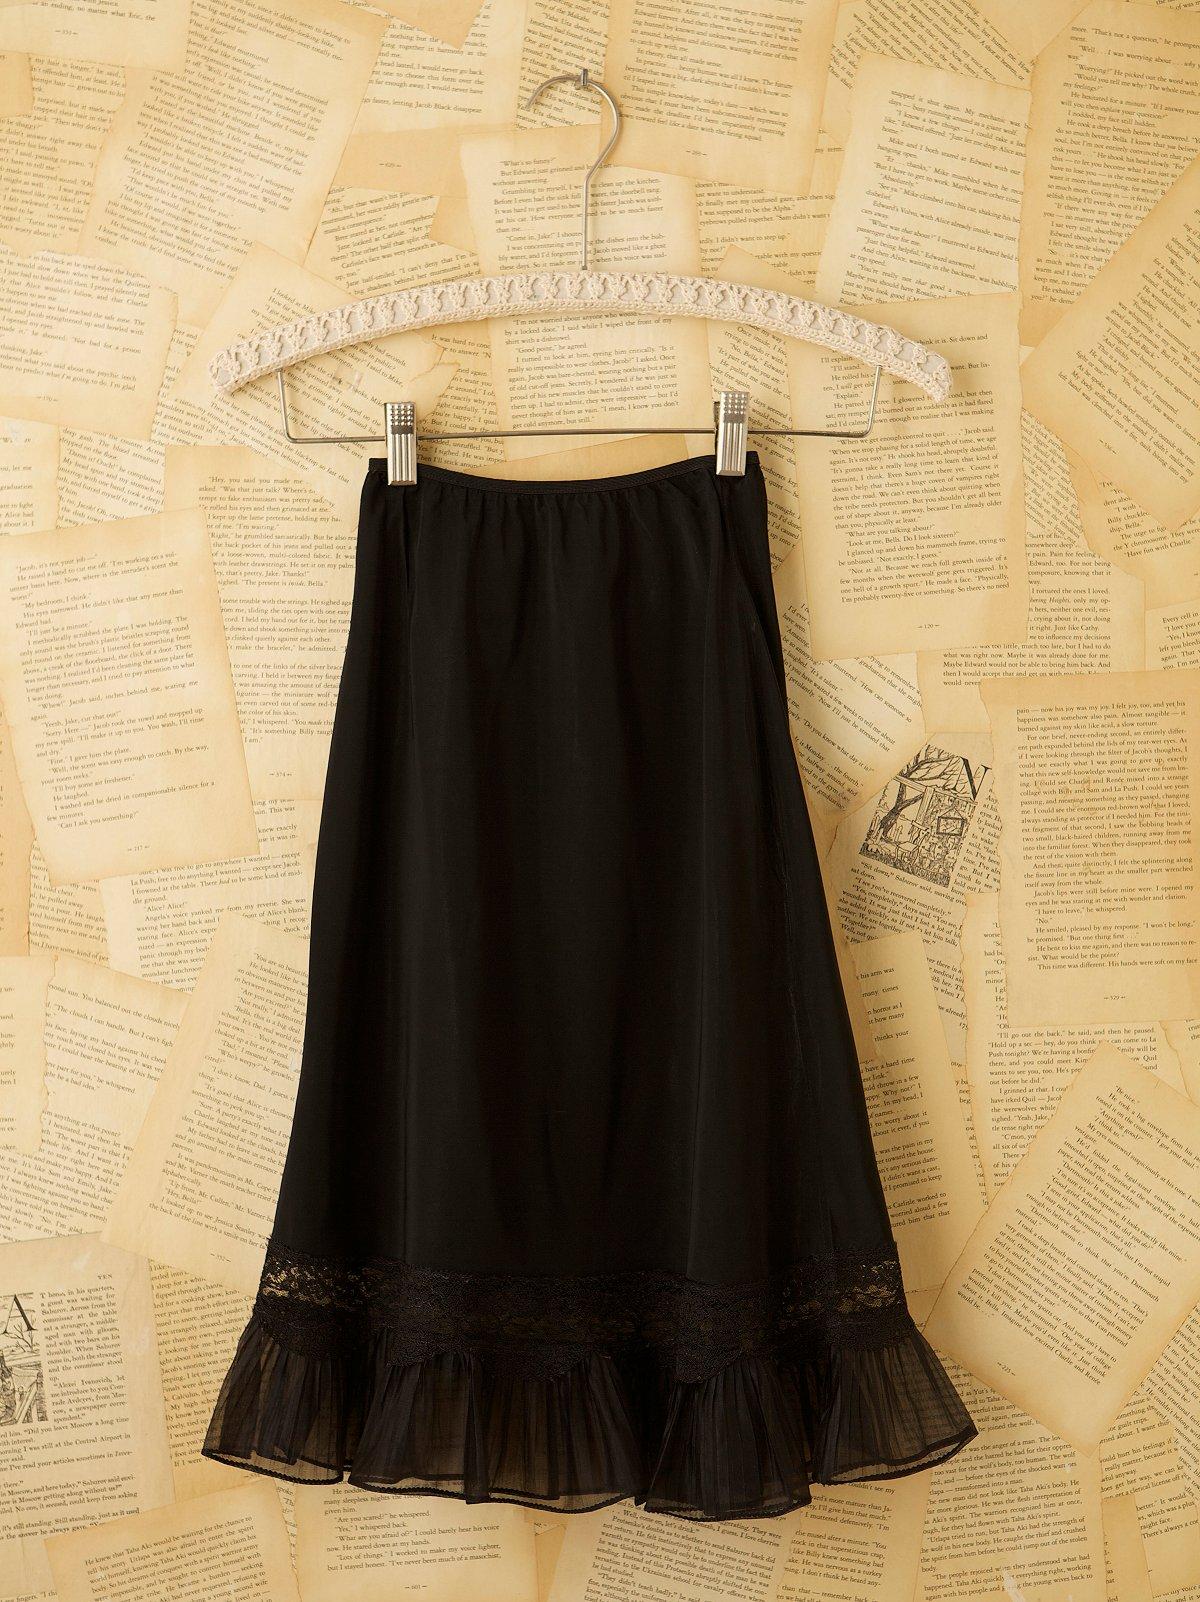 Vintage 1940s Rayon Slip Skirt